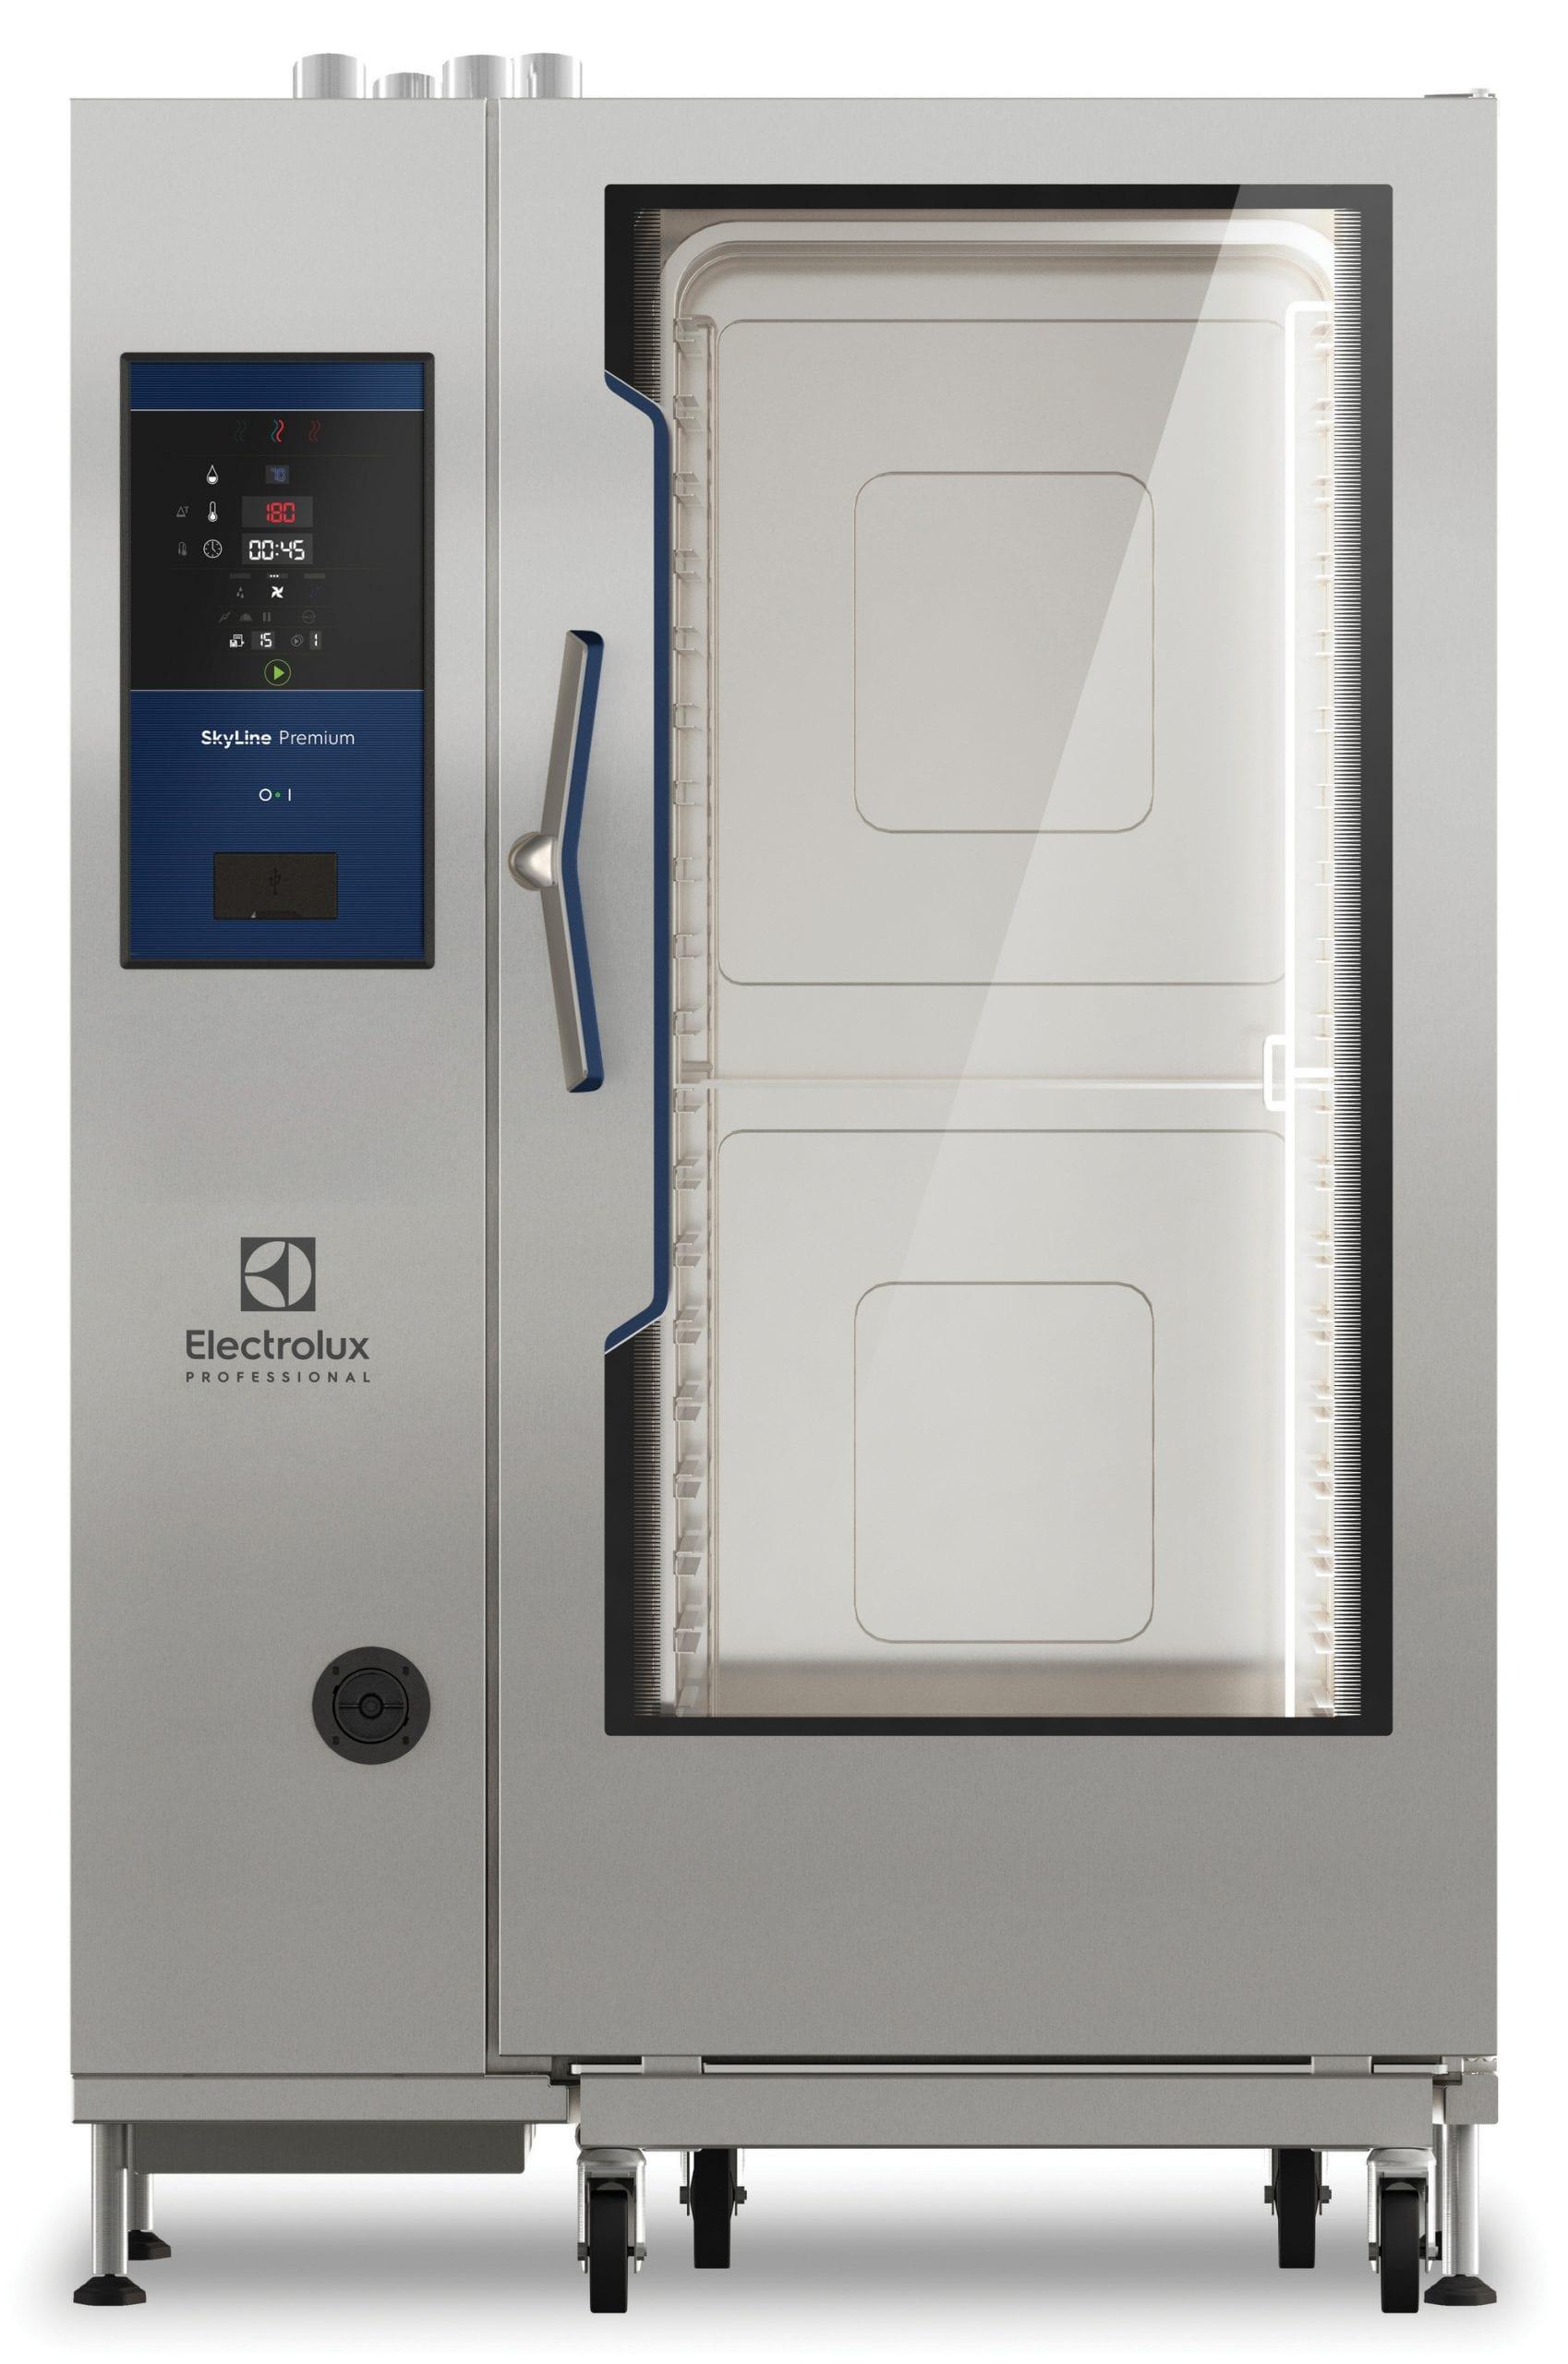 Combi Oven Skyline Premium 20 GN 2/1 Image